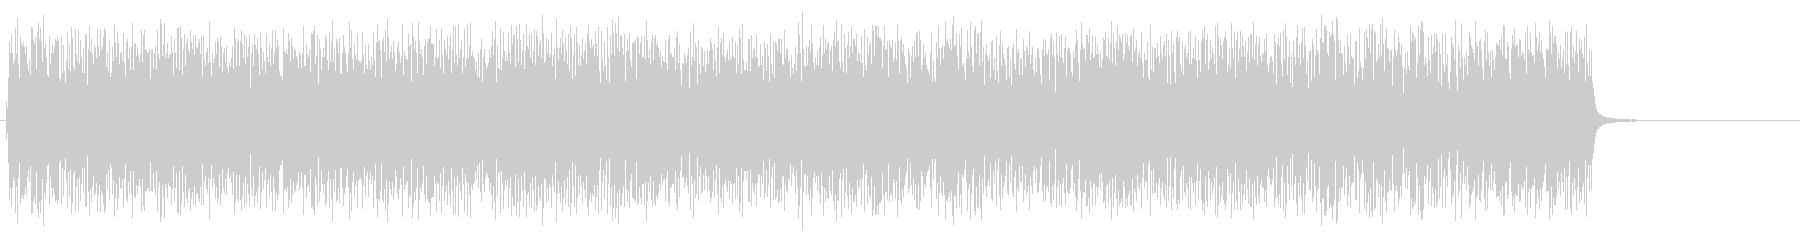 [Raw recording] Bell type alarm clock 01's unreproduced waveform